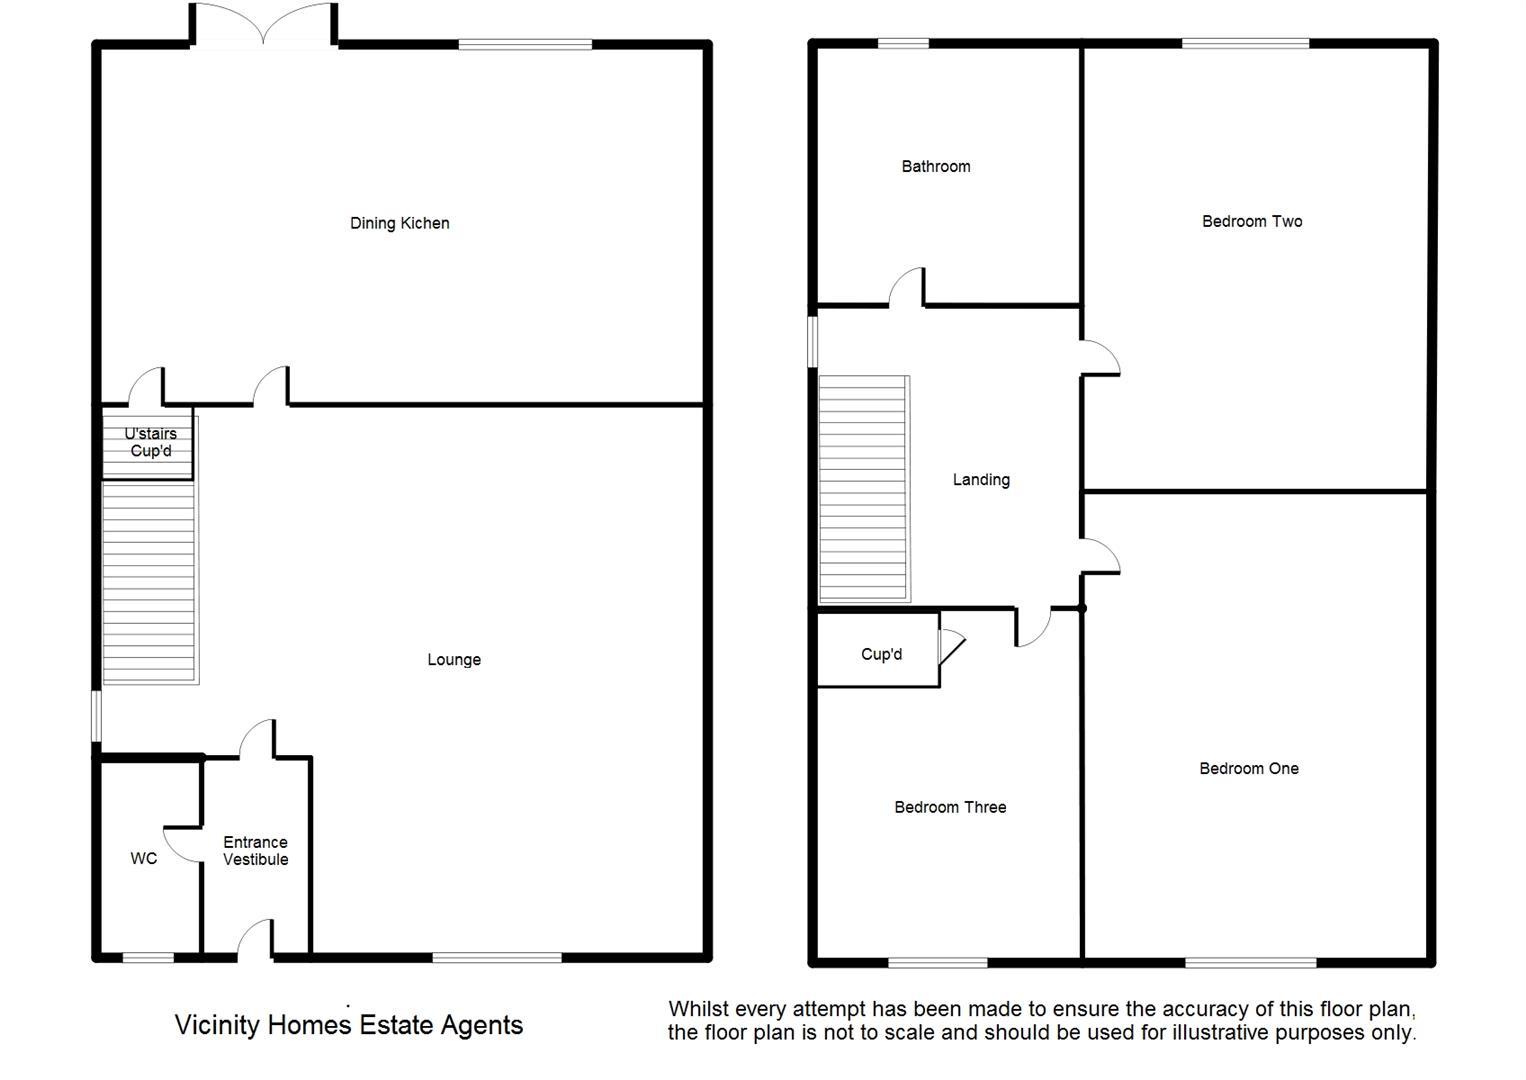 Home On Sale 42 Cavaghan Gardens Carlisle 129,995